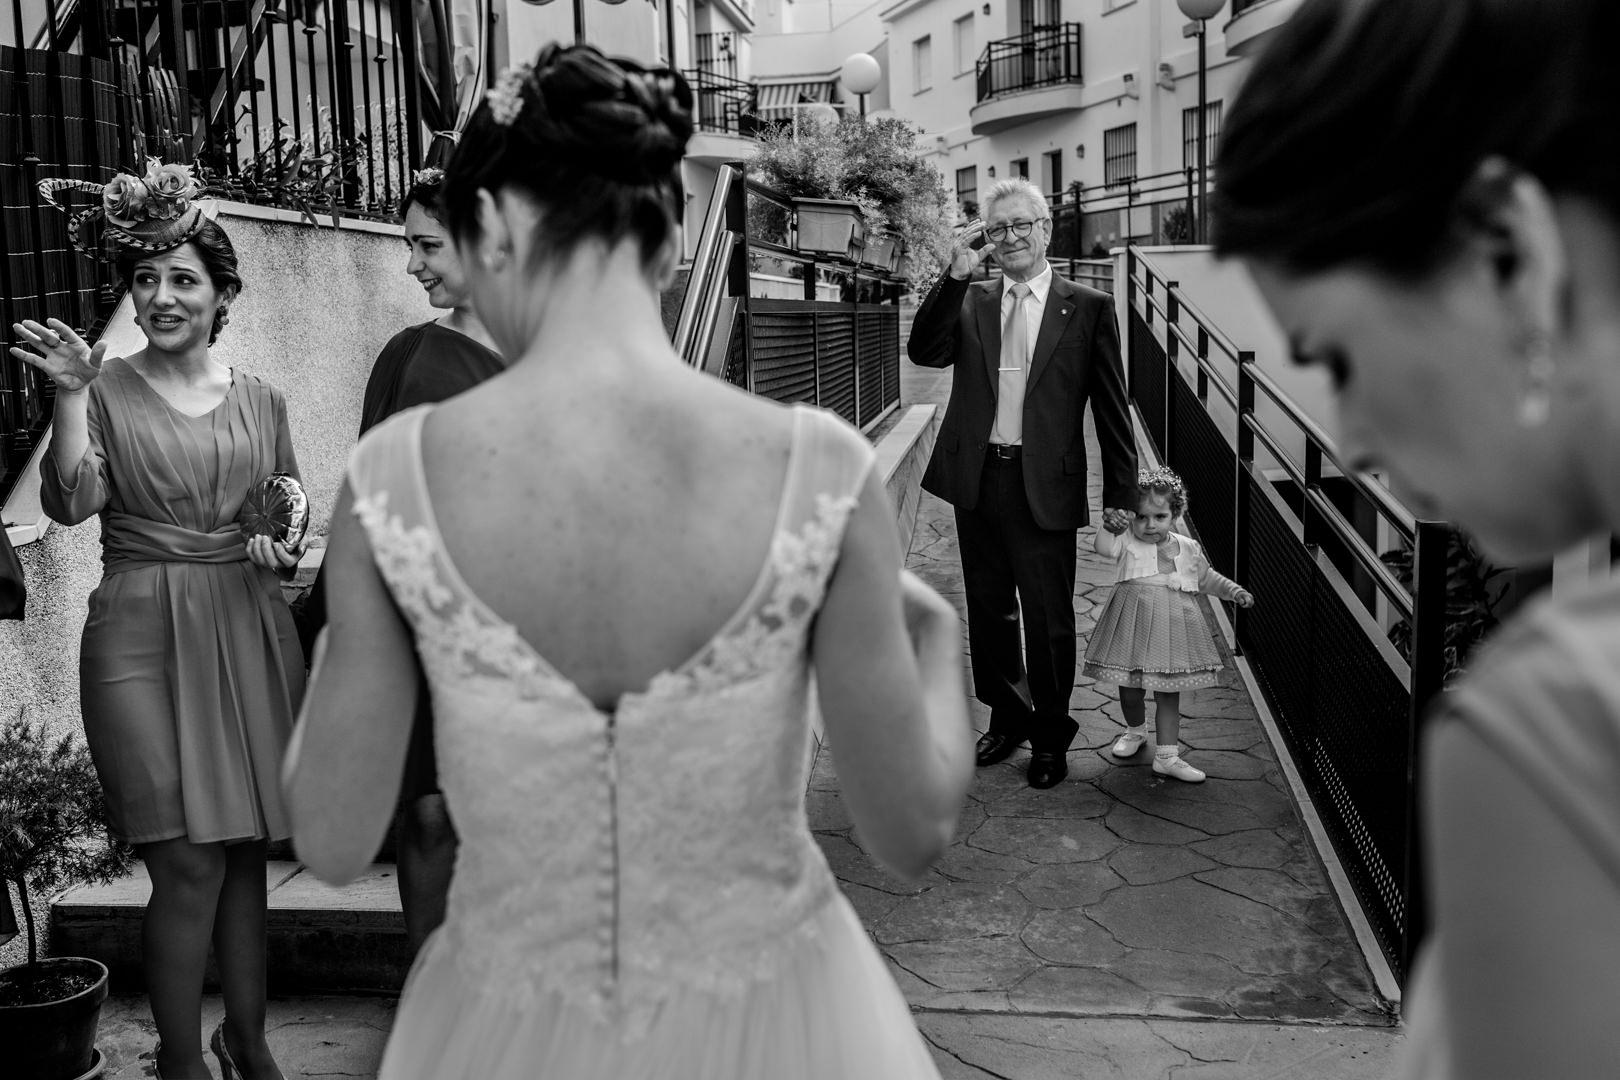 Boda-Hacienda-LOrigen-Pepe-Maria-engagement-Rafael-Torres-fotografo-bodas-sevilla-madrid-barcelona-wedding-photographer--16.jpg